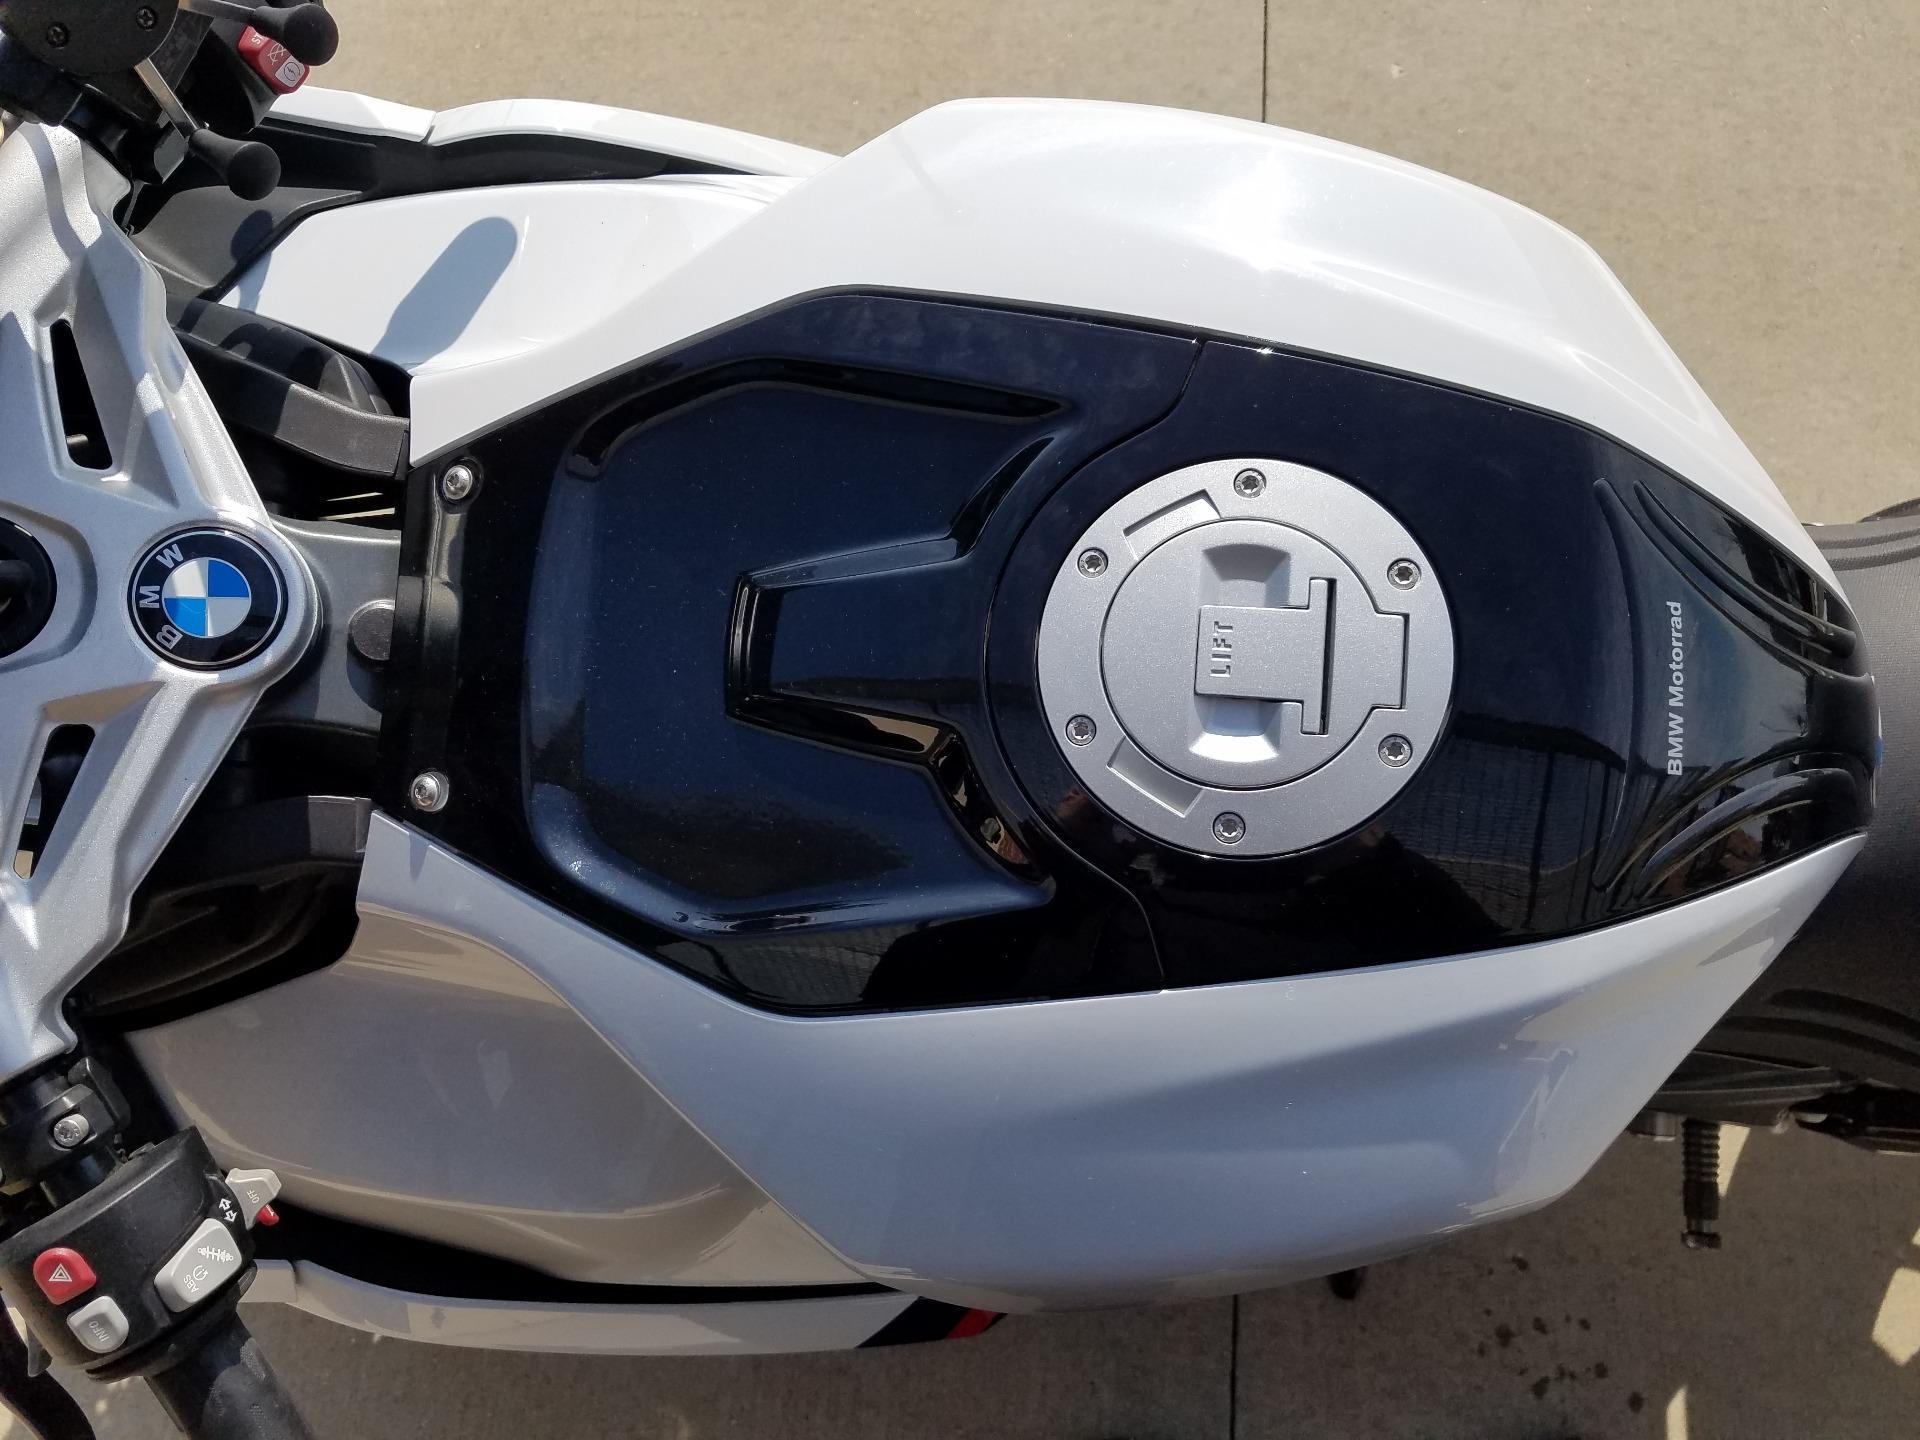 2015 Bmw K 1300 S Motorcycles Saint Charles Illinois